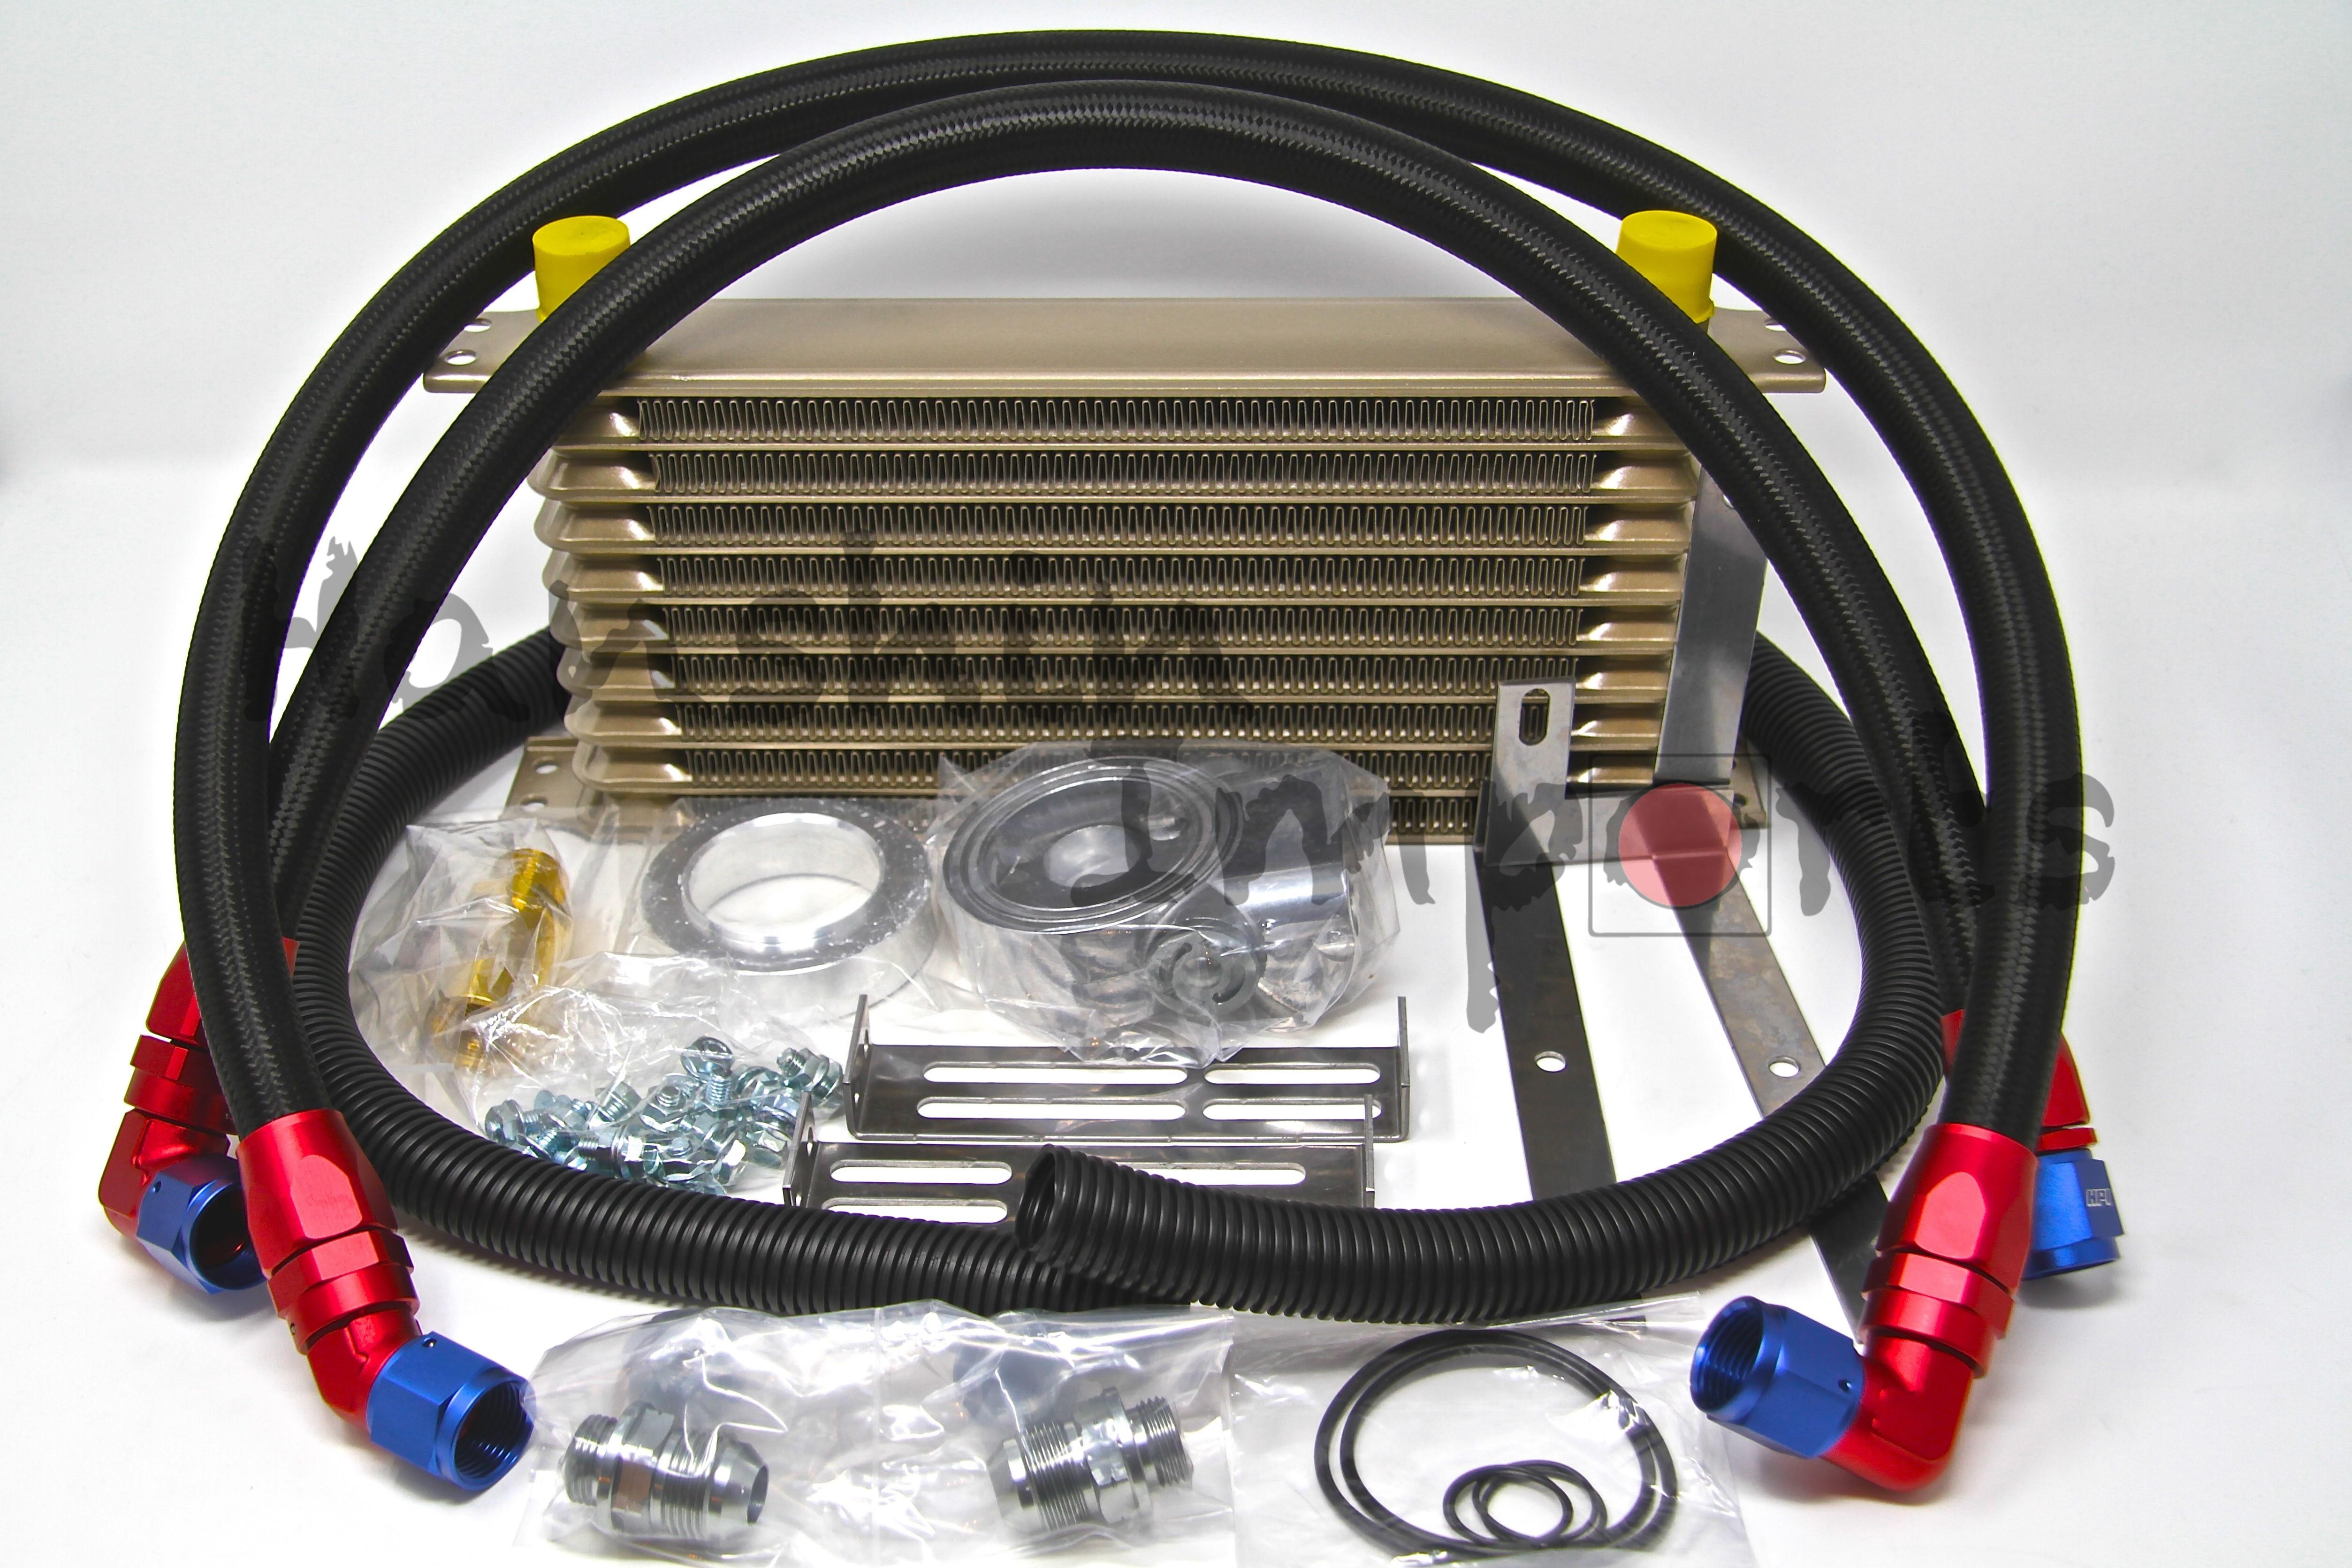 HPI Oil Cooler kit for Nissan 350Z / Fairlady Z Z33